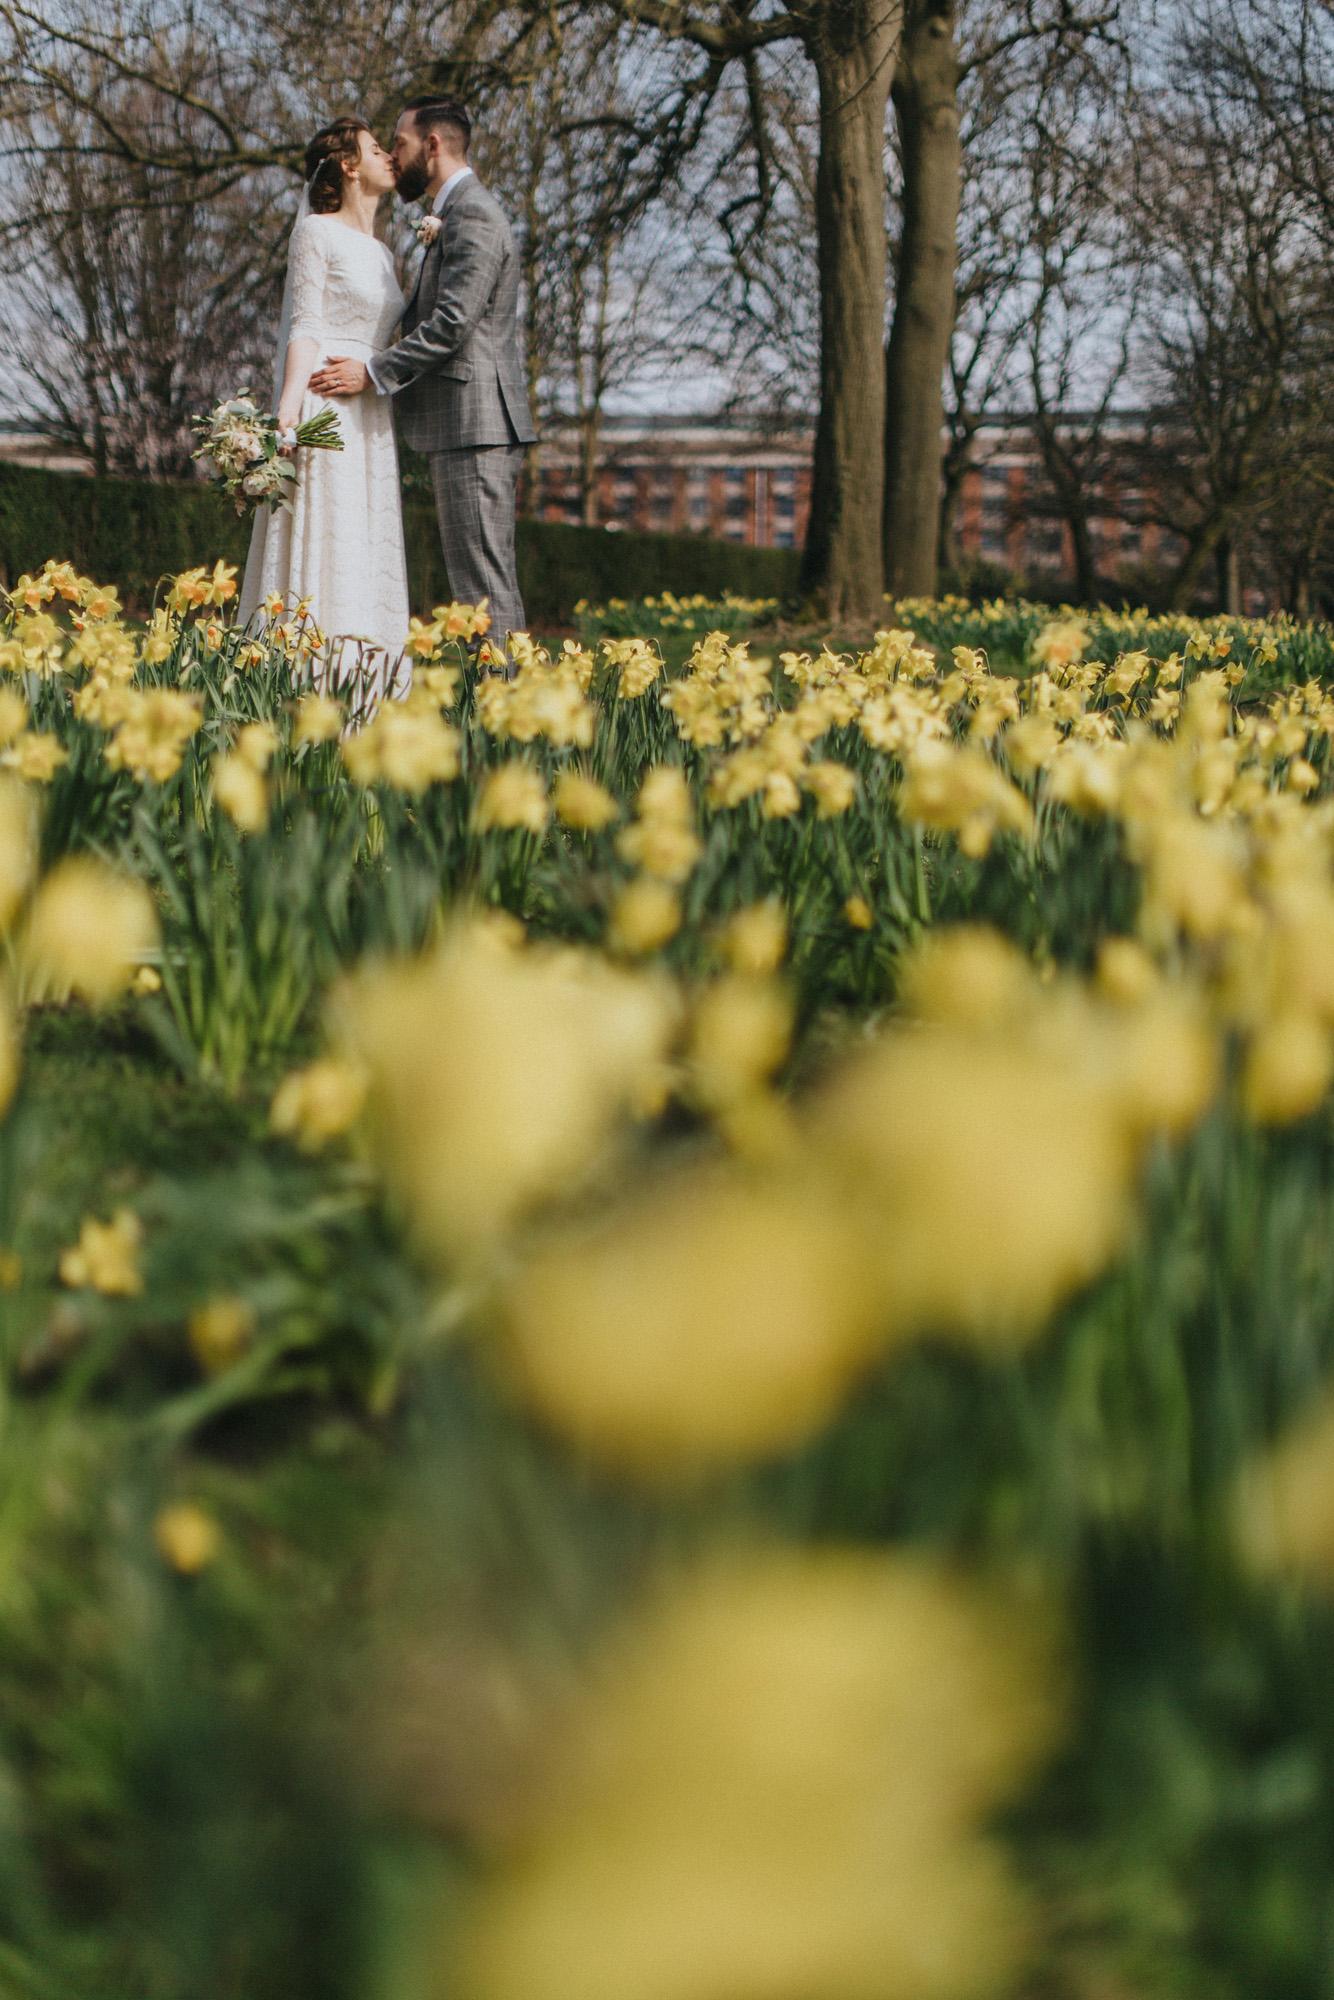 Kate-Beaumont-Lace-Flared-Dahlia-Gown-Leeds-Wedding-Bloom-Weddings-33.jpg